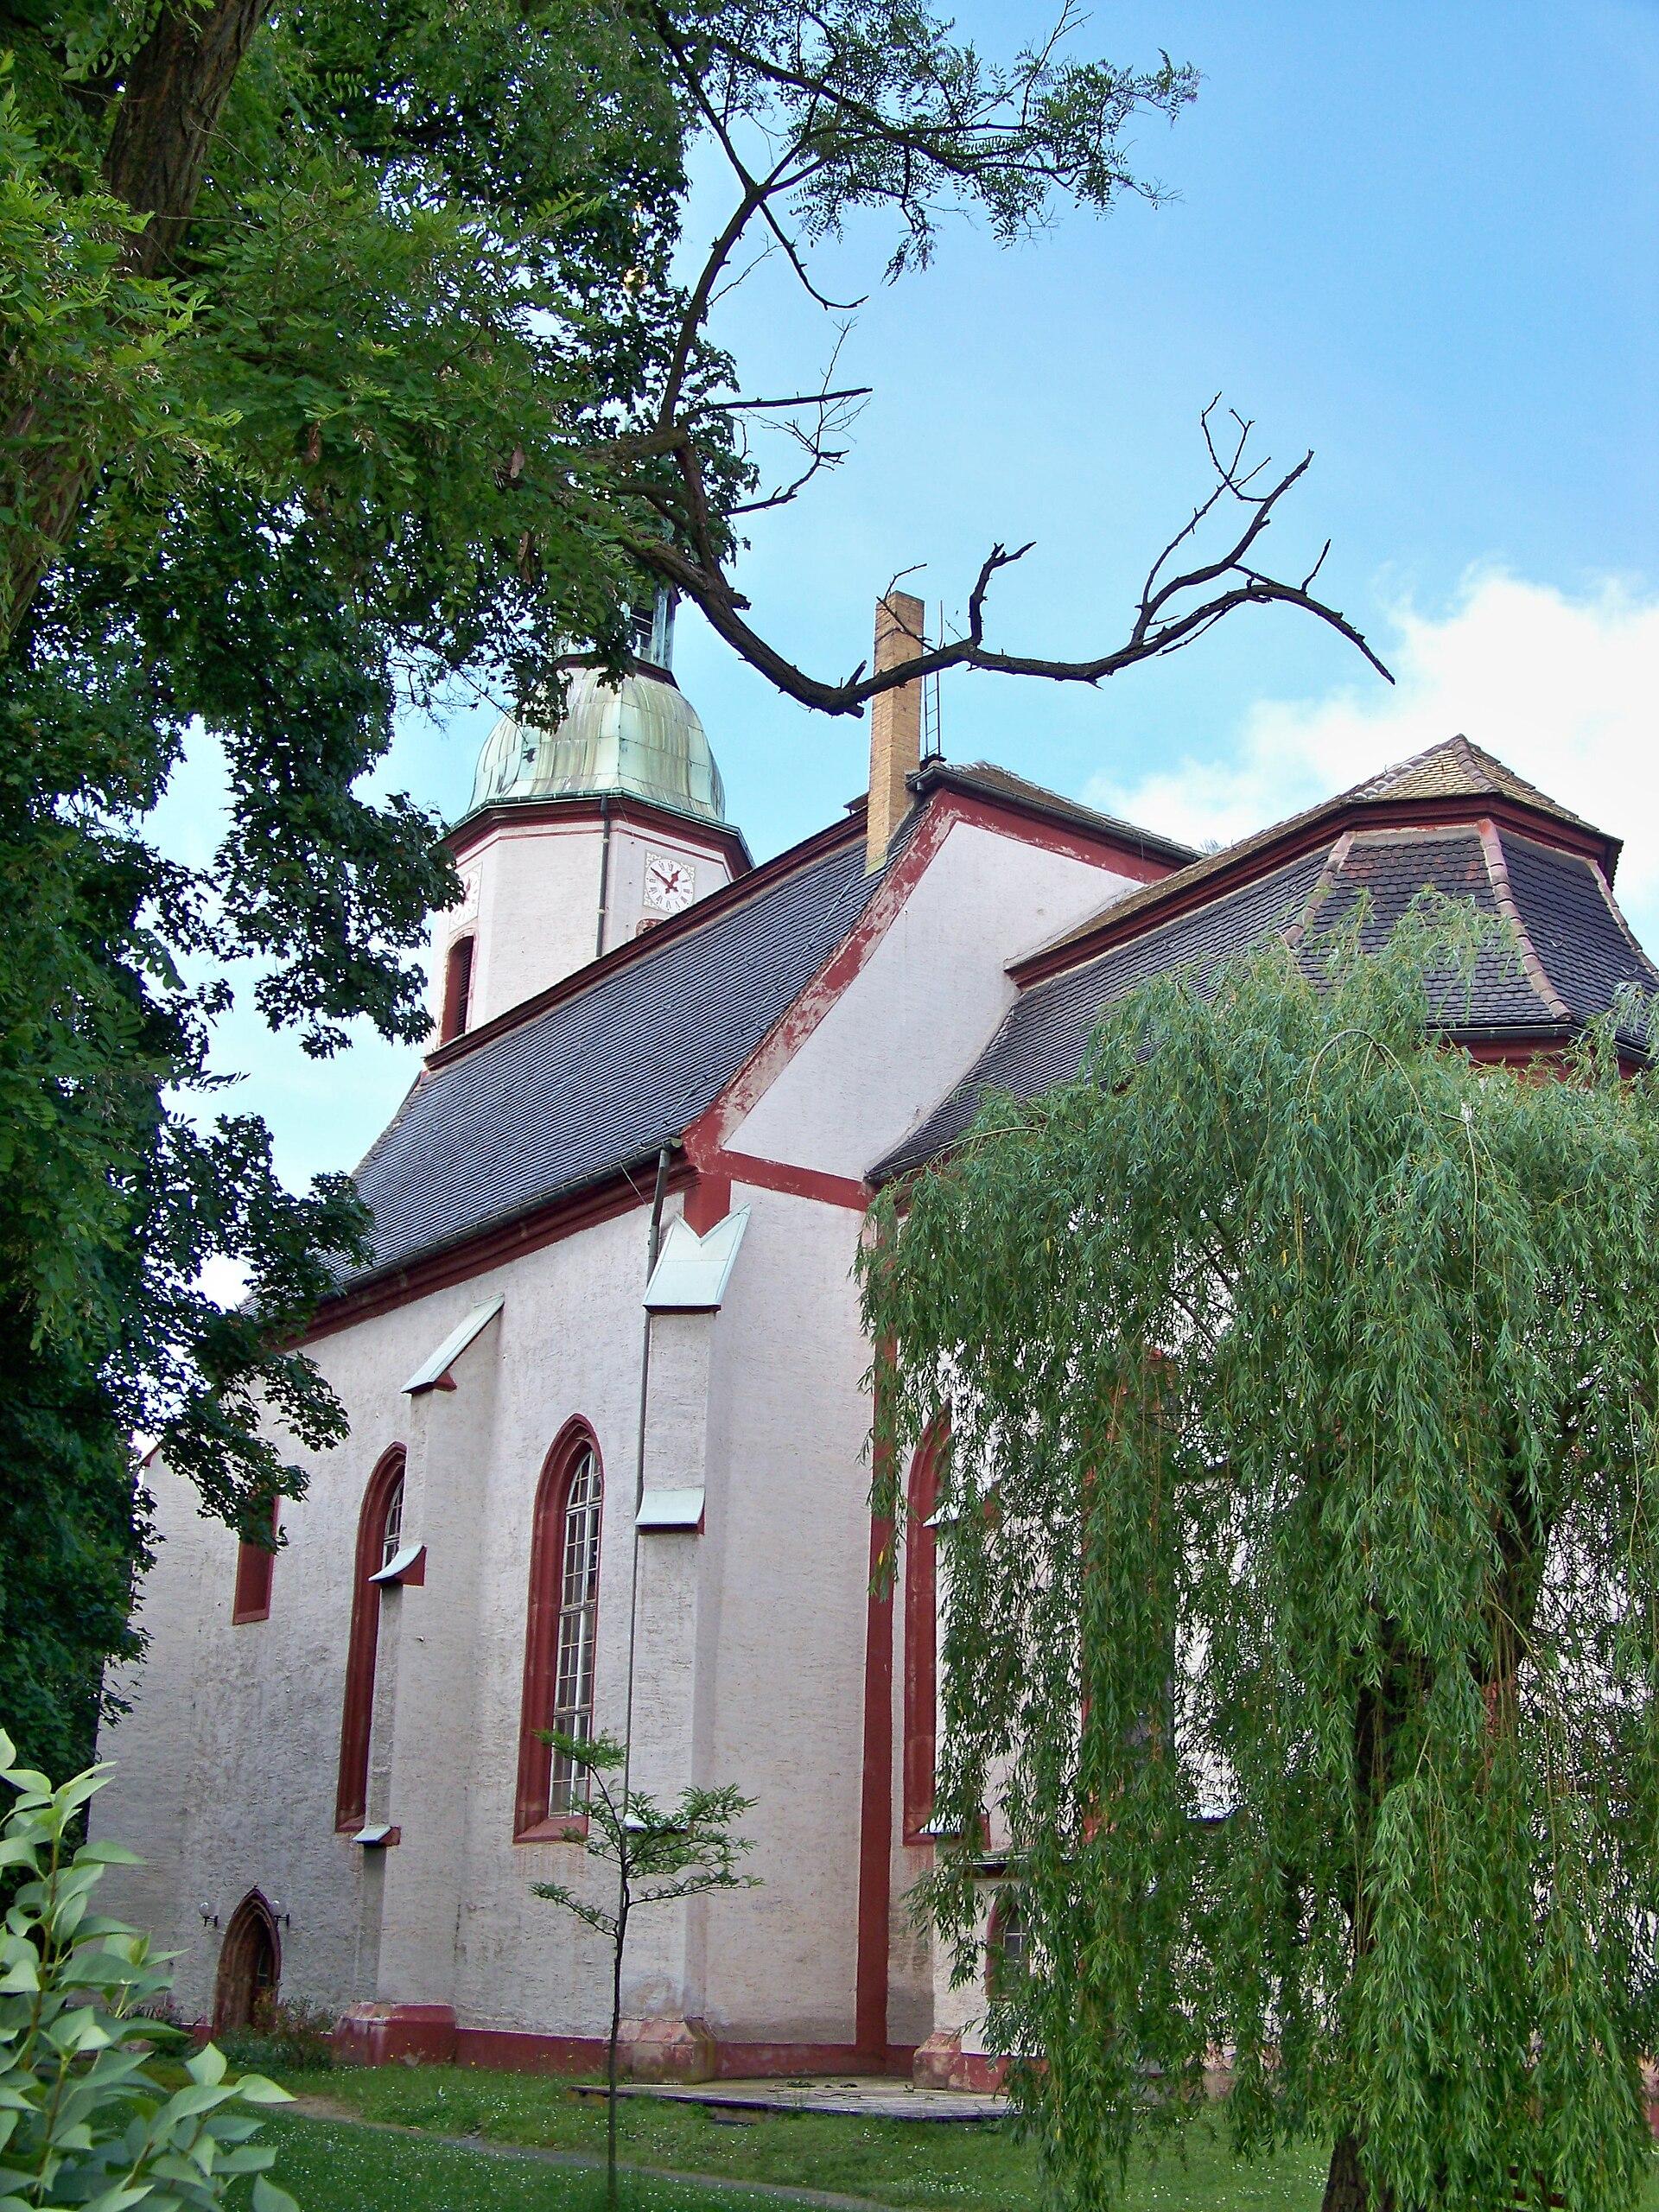 Naunhof Bei Leipzig